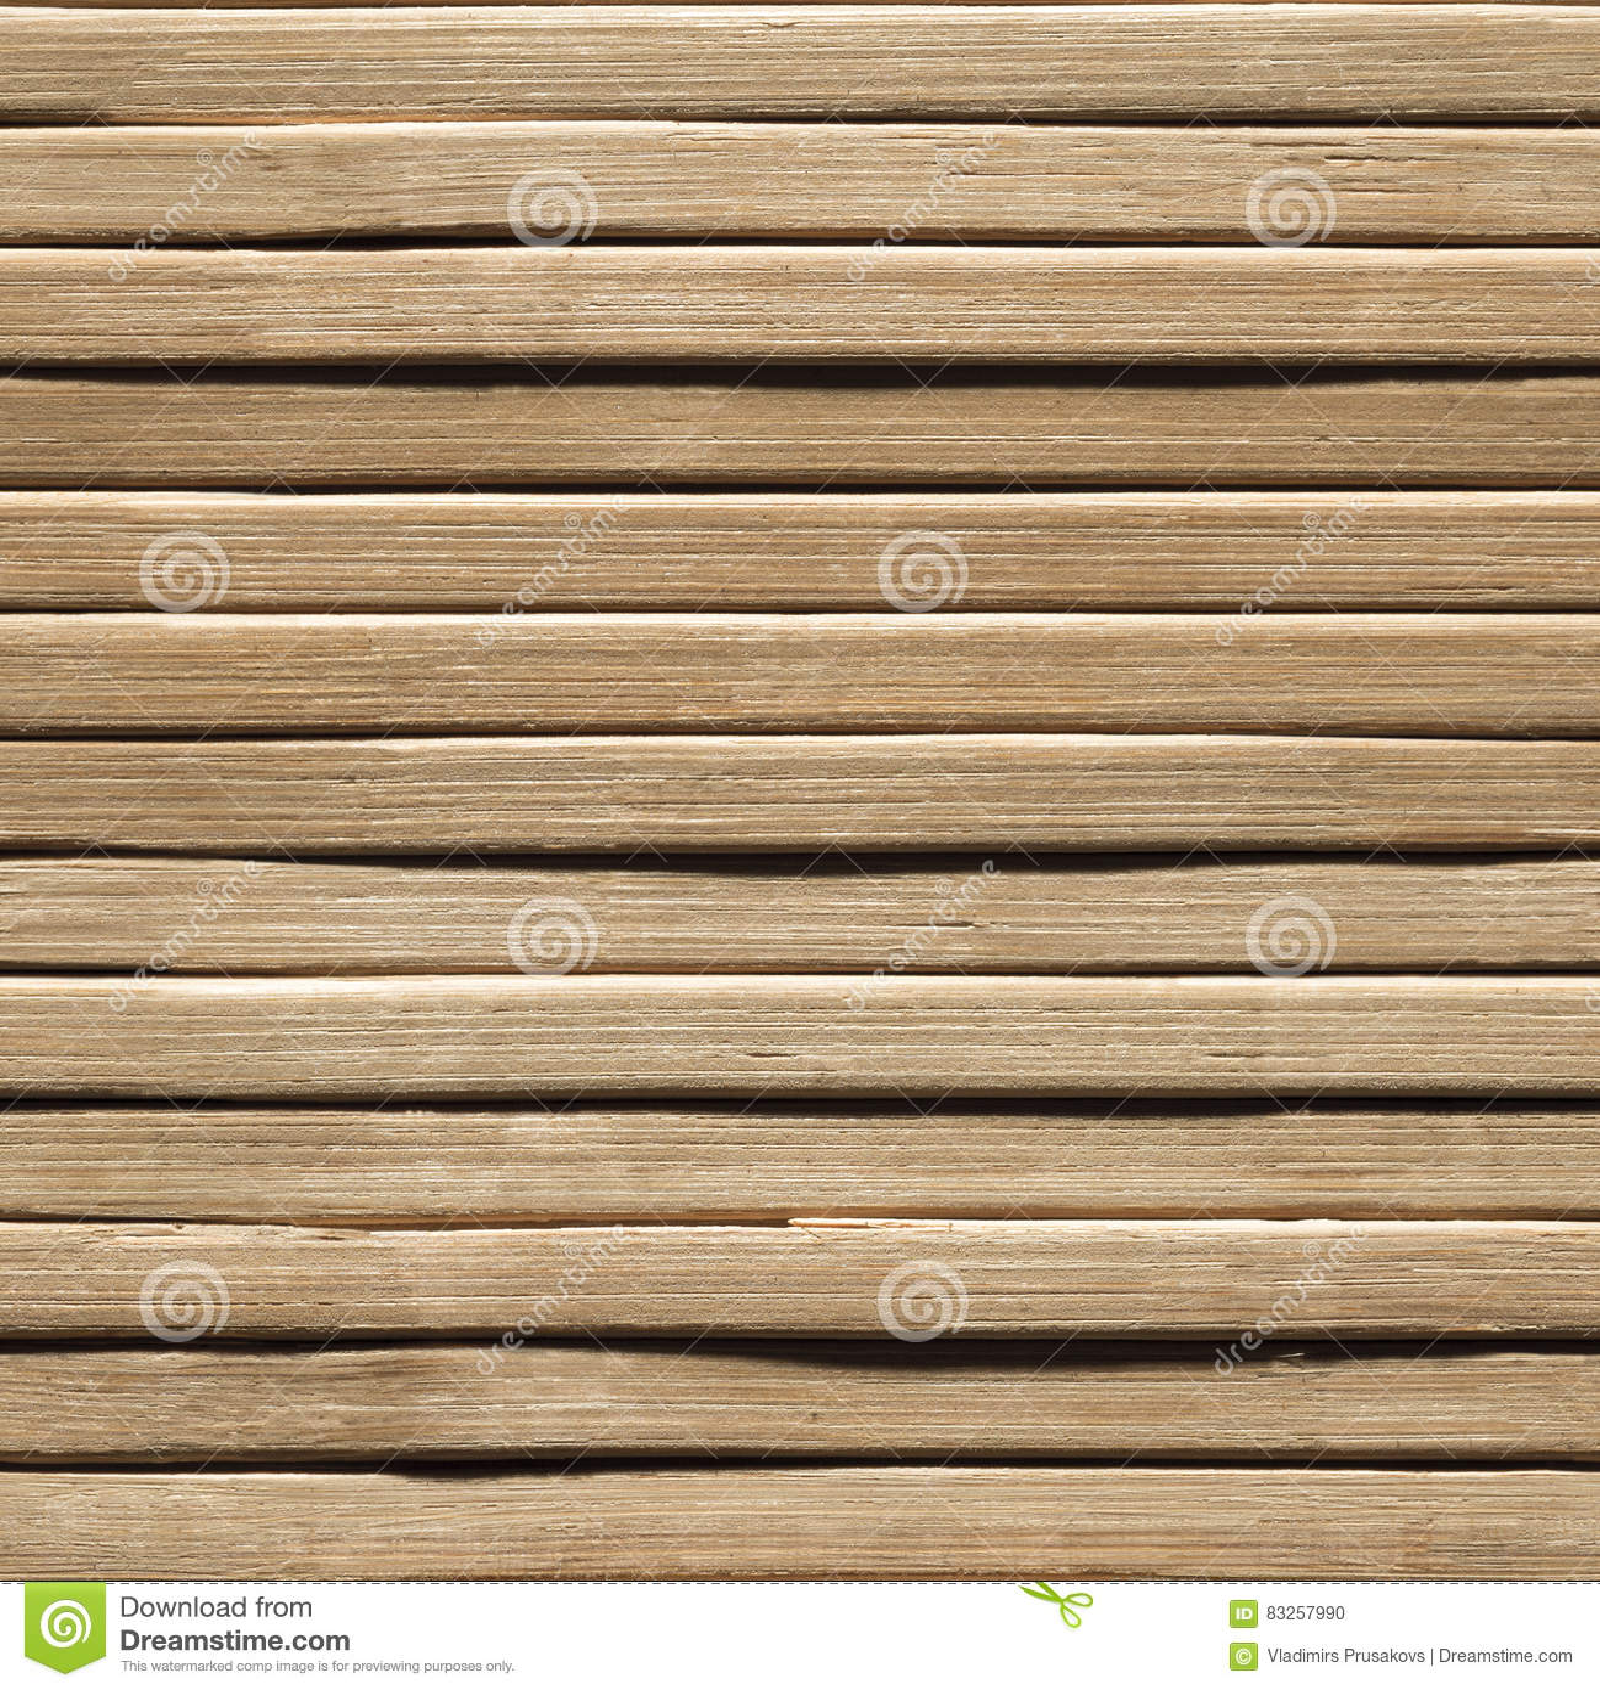 Fundo sem emenda de madeira, textura de madeira de bambu da prancha, parede das pranchas